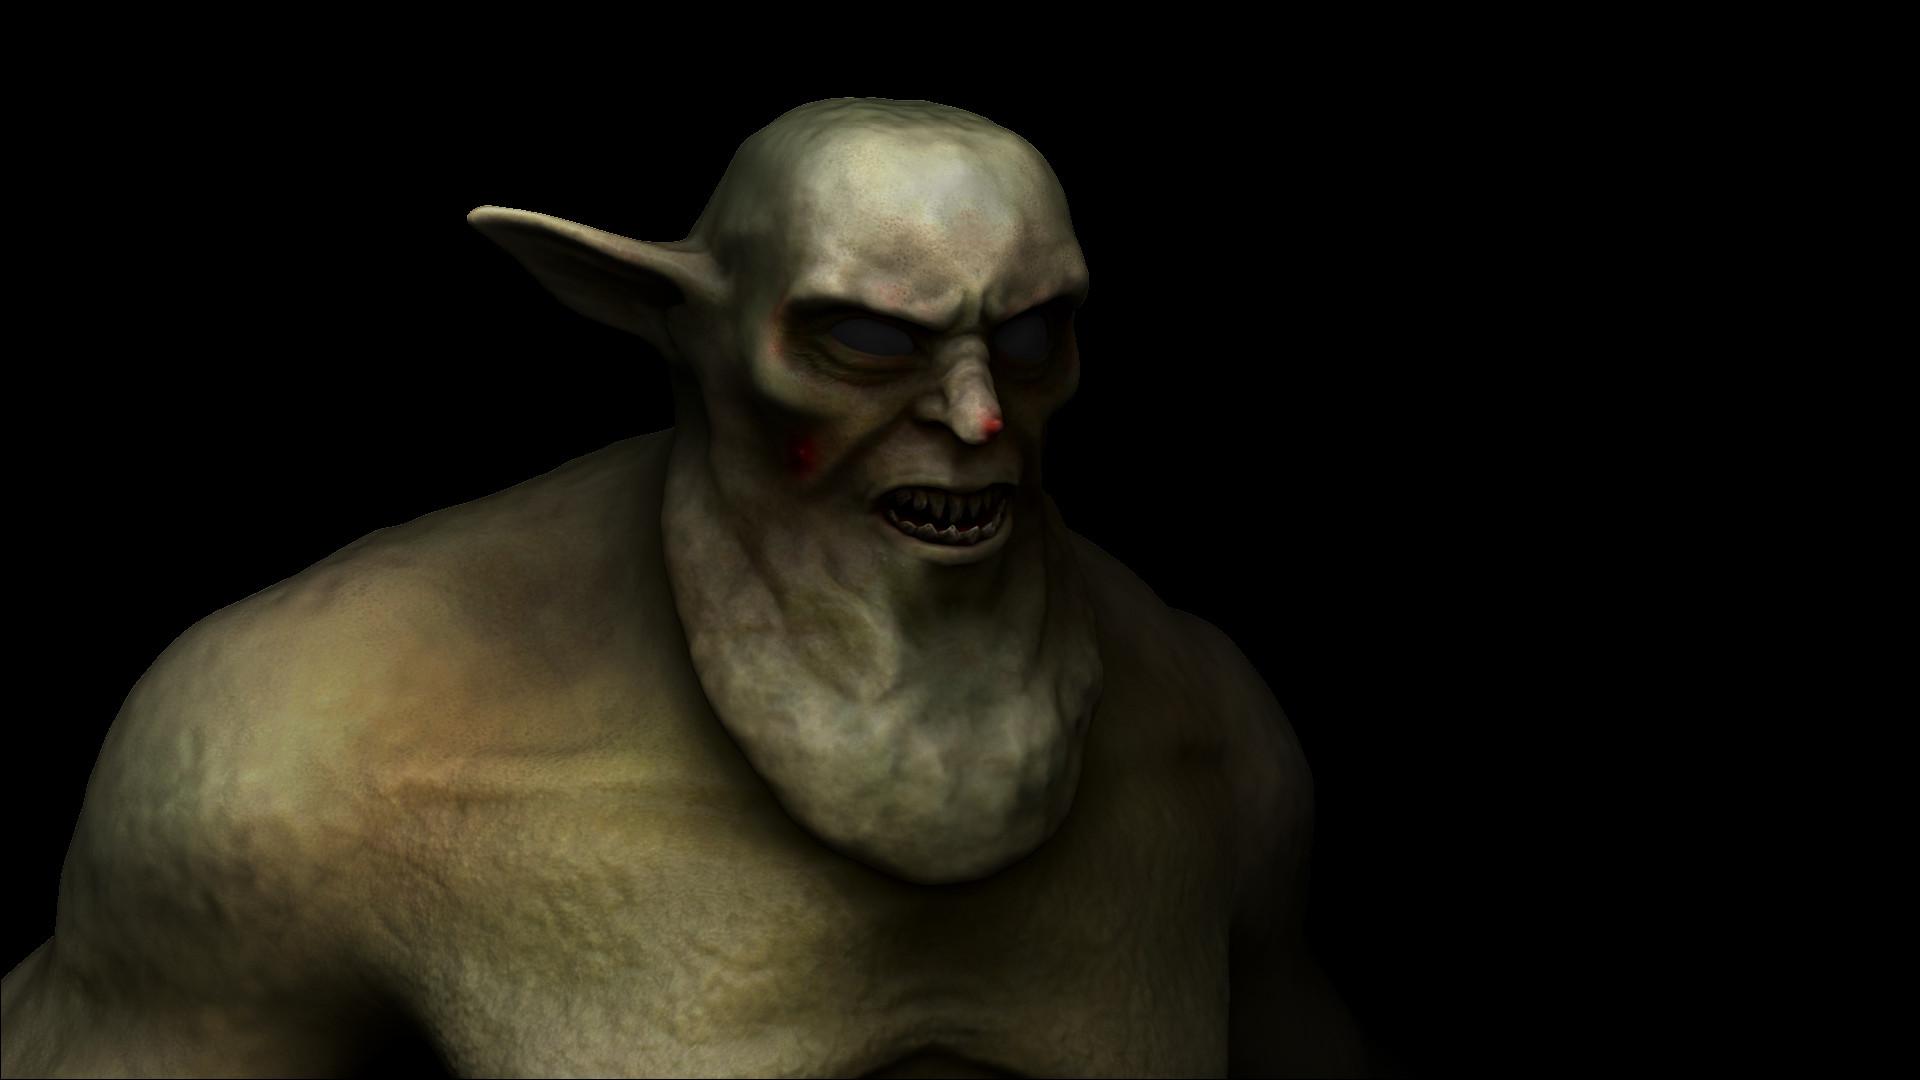 Mitchell sisson troll1 render4